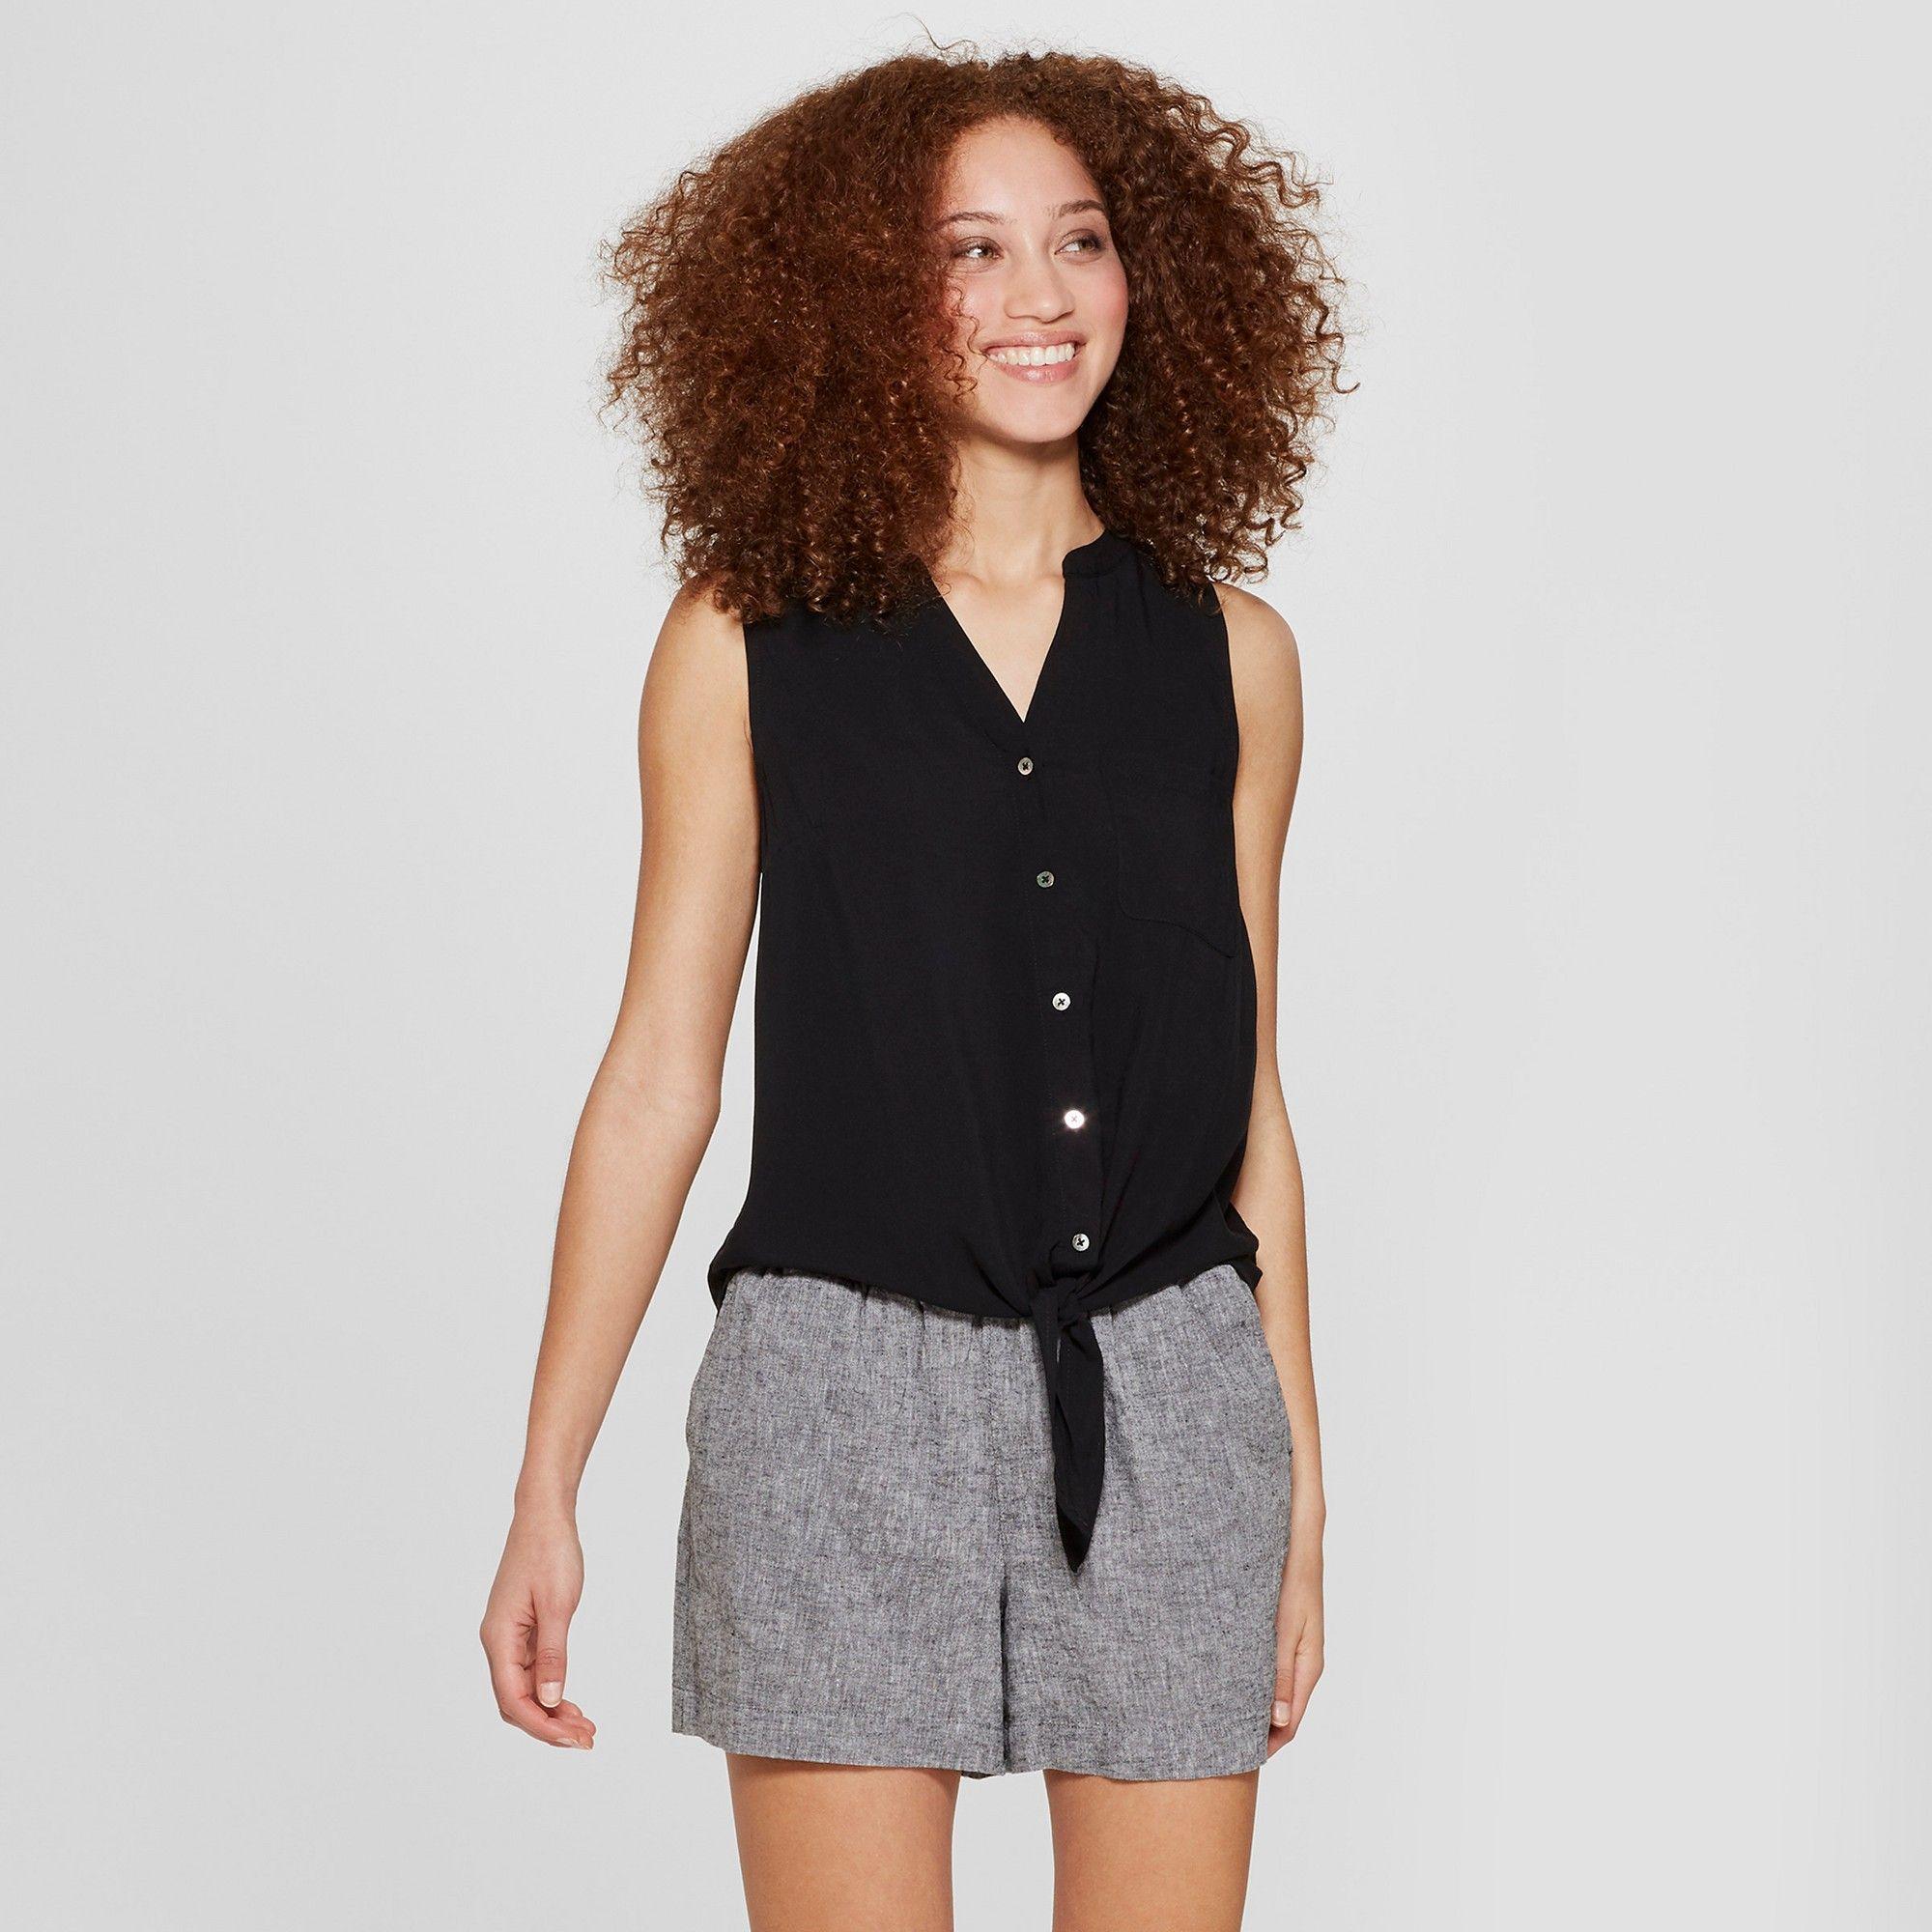 0b1217b62cd24 Women s Sleeveless Button-Down Tie Front Top - A New Day Black Xxl ...